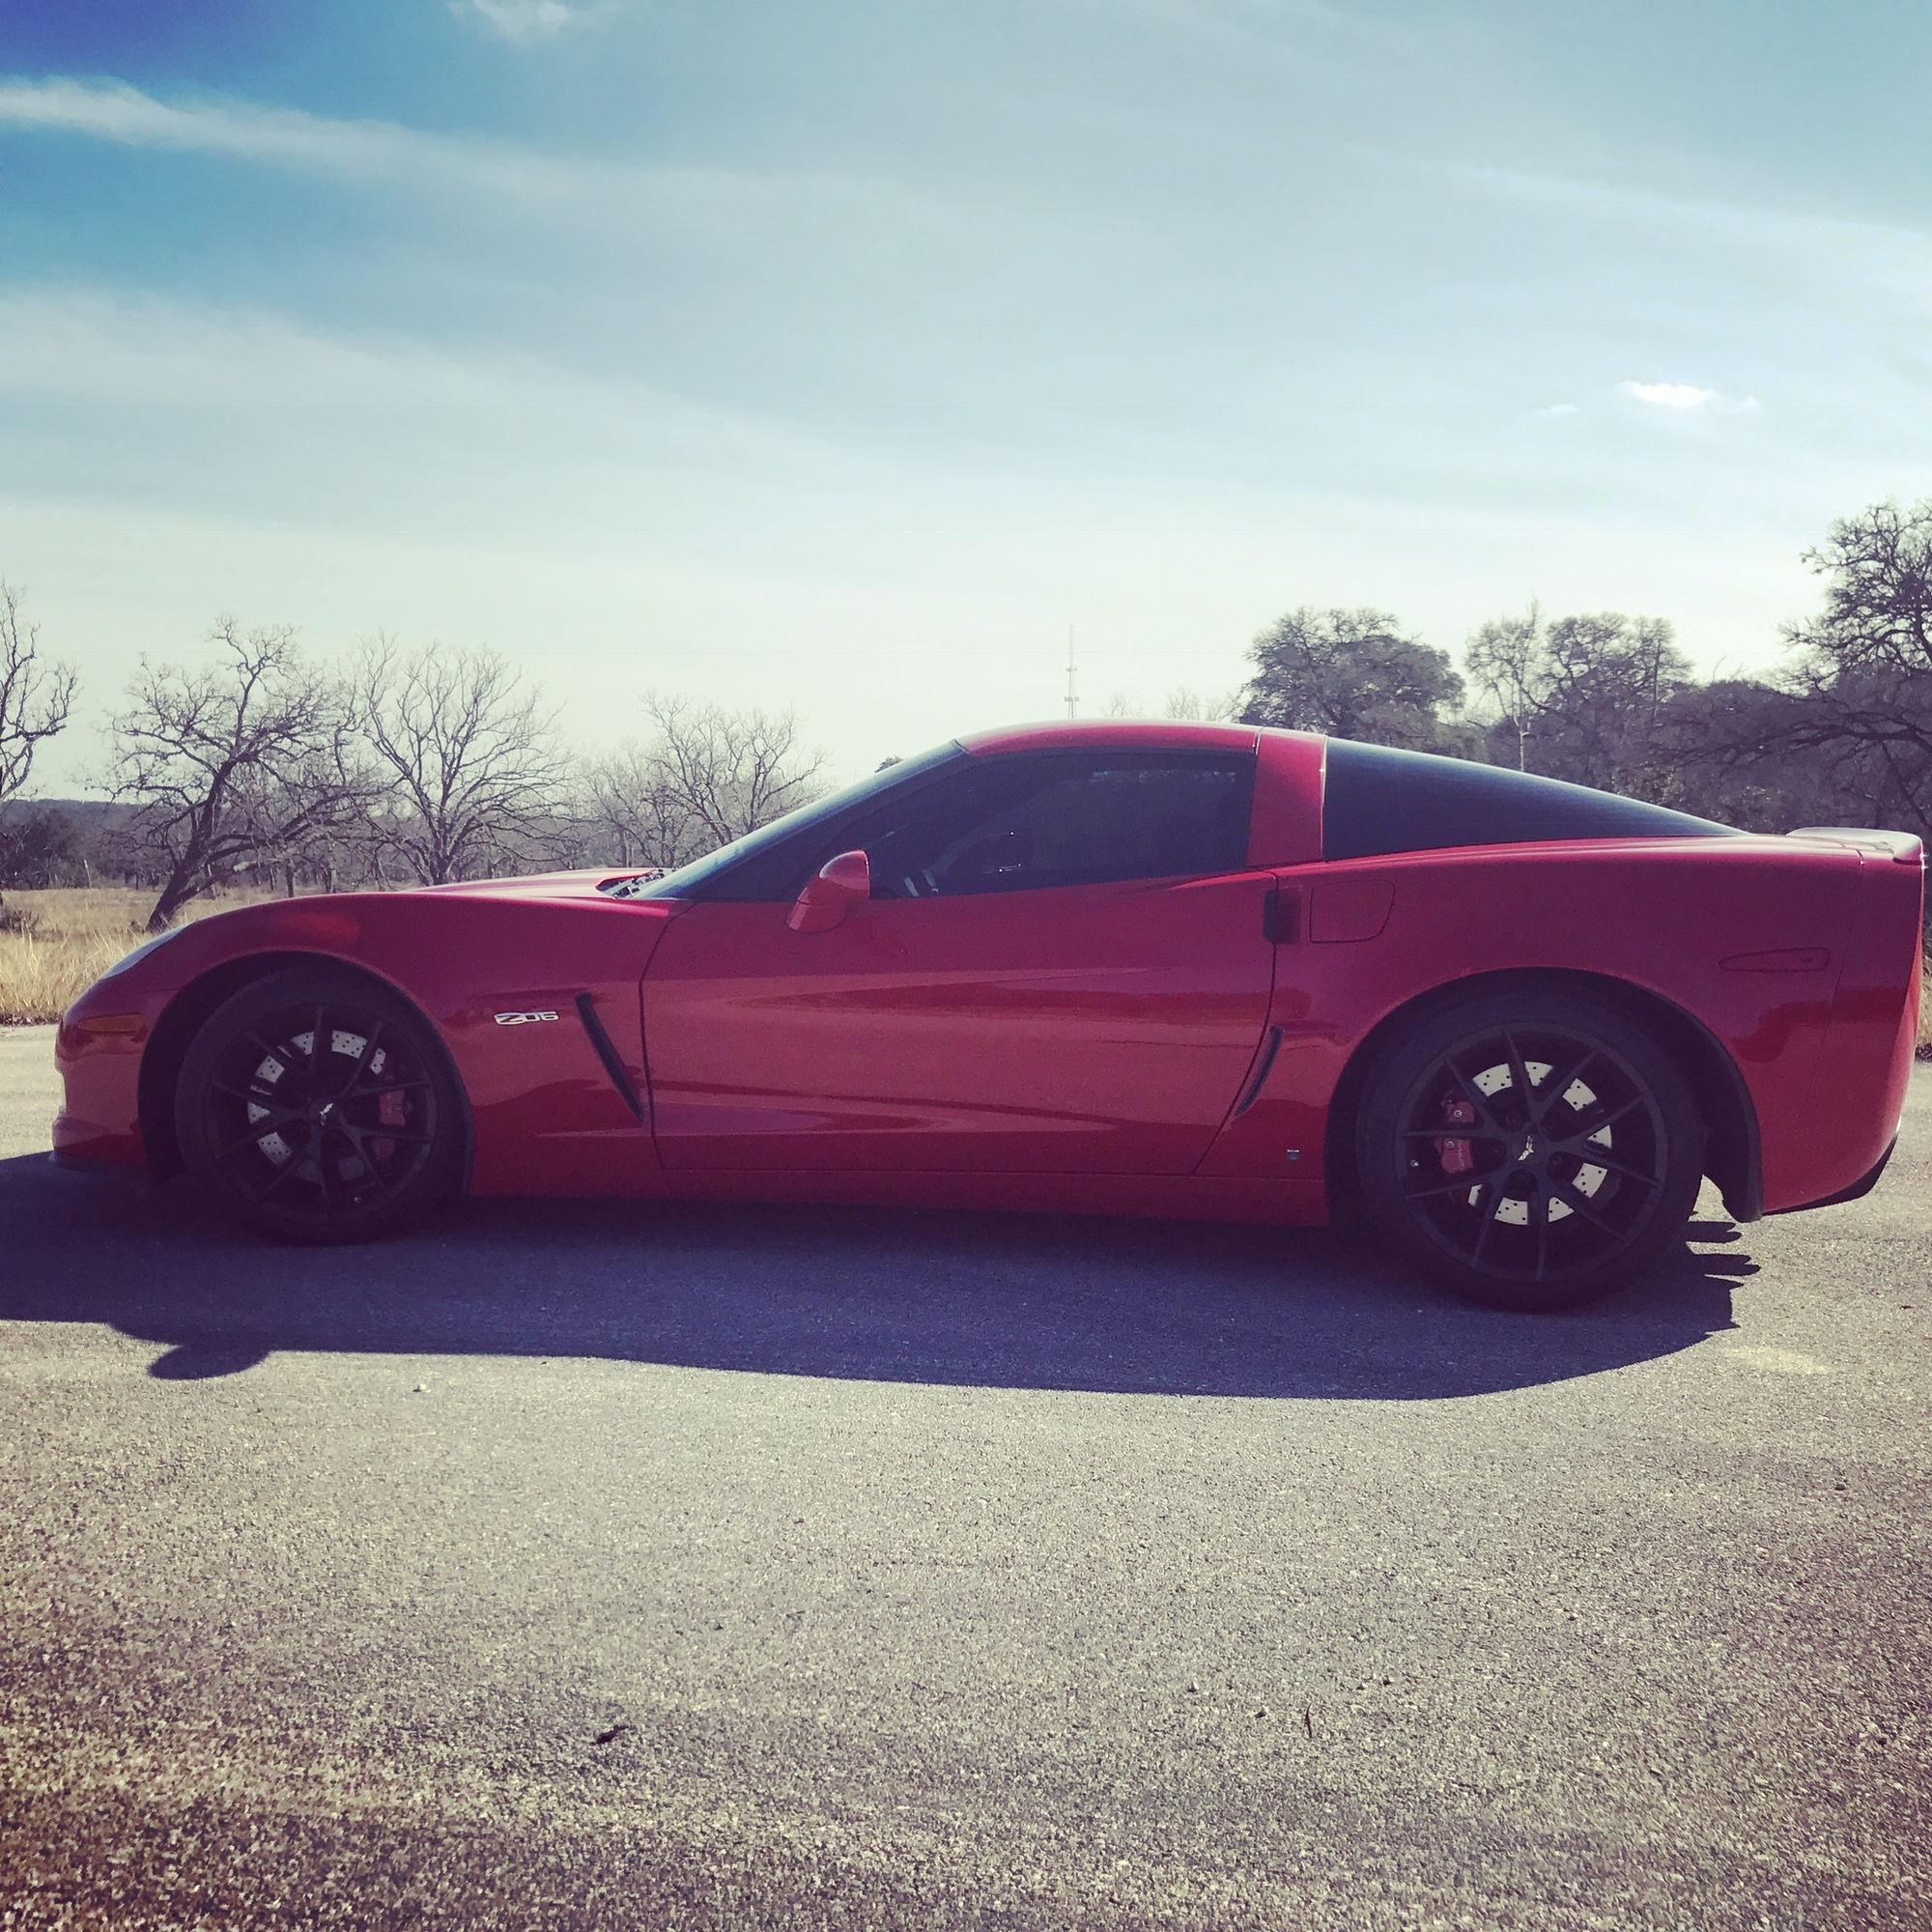 fs for sale 2009 c6 z06 victory red for sale in sa tx corvetteforum chevrolet corvette. Black Bedroom Furniture Sets. Home Design Ideas